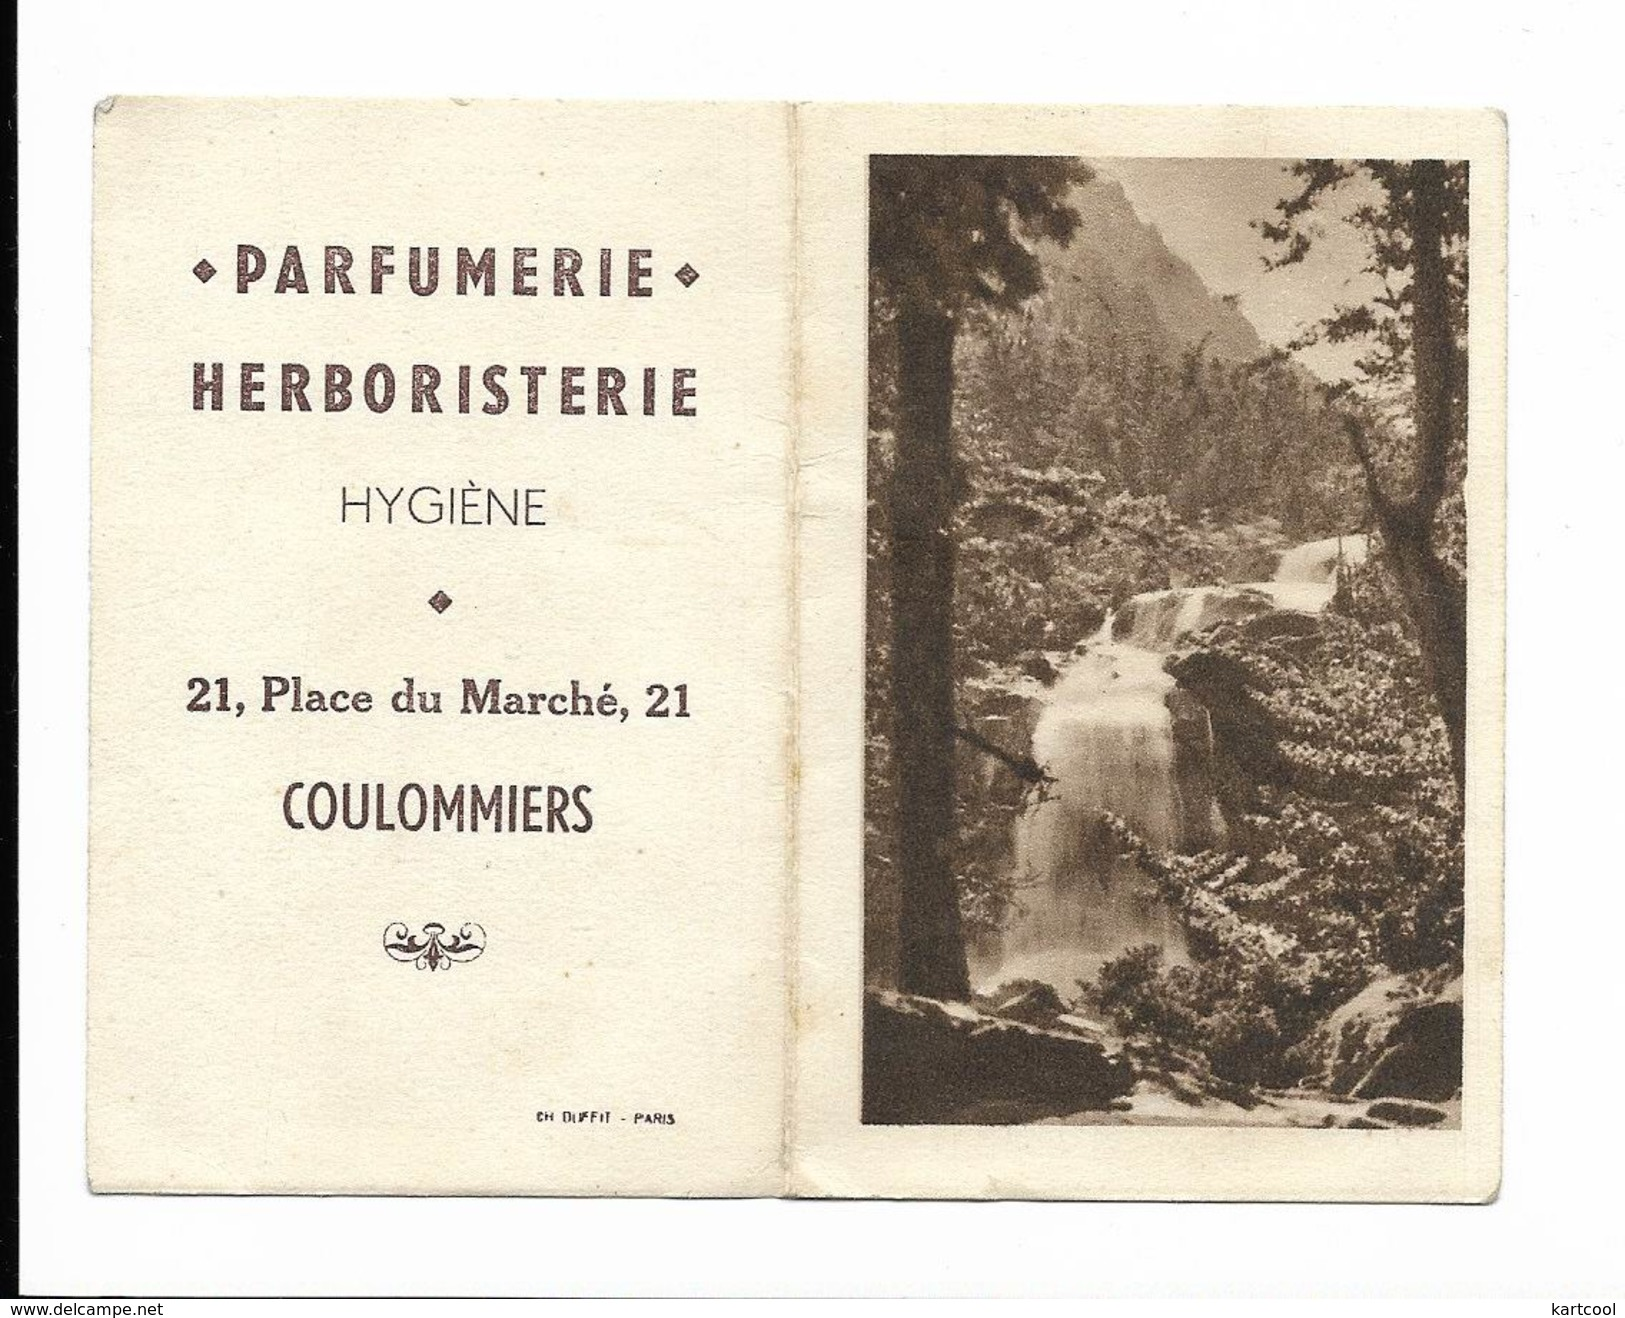 Calendrier De Poche 1948 - Coulommiers Parfumerie Herboristerie - Calendriers